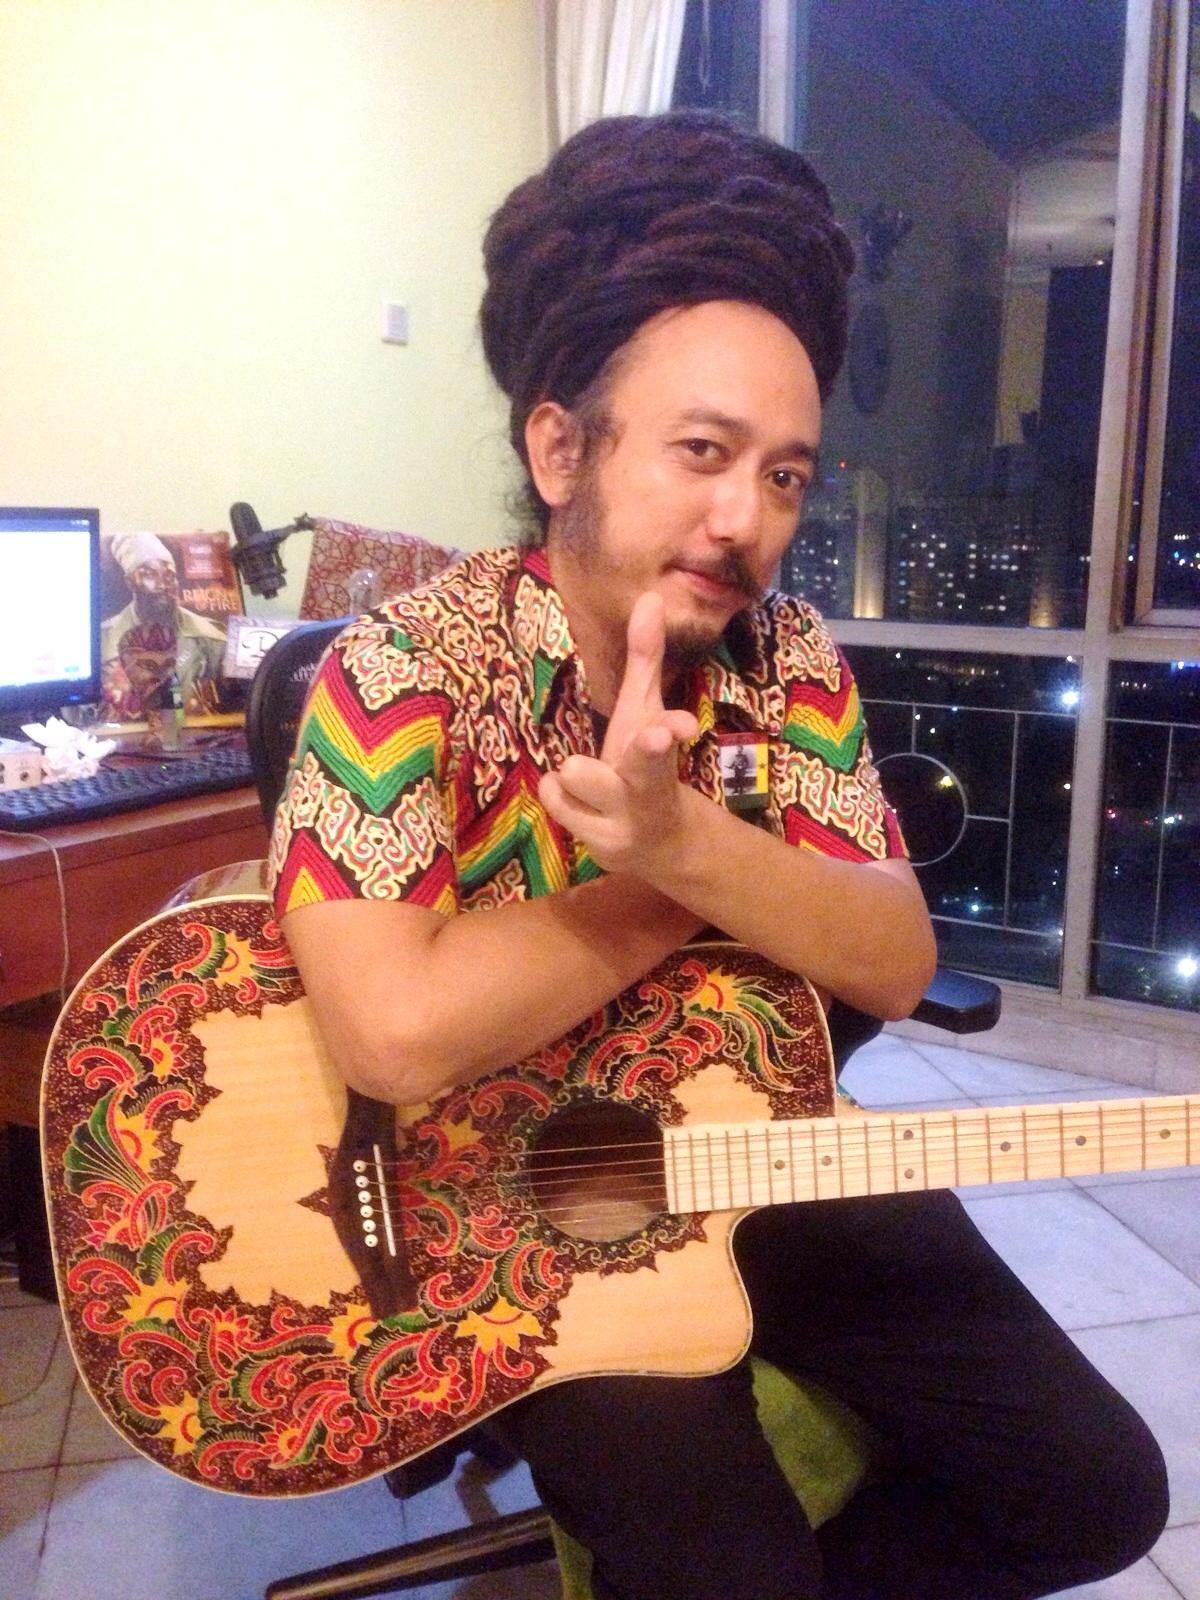 Ras Muhamad - Musician And Reggae Ambassador Of Indonesia